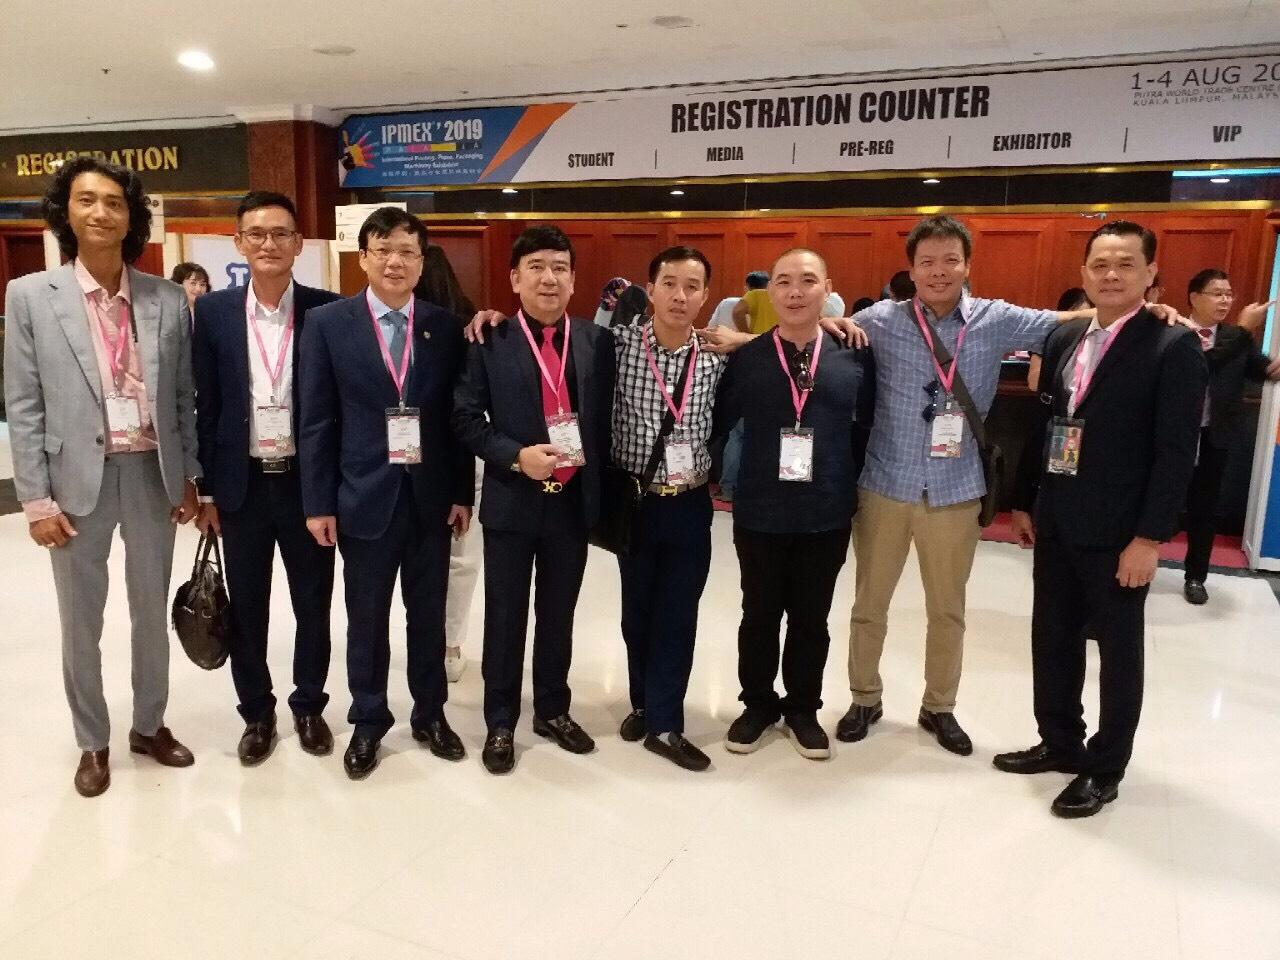 khai-mac-trien-lam-quoc-te-nganh-quang-cao-ipmex-2019-tai-malaysia-2